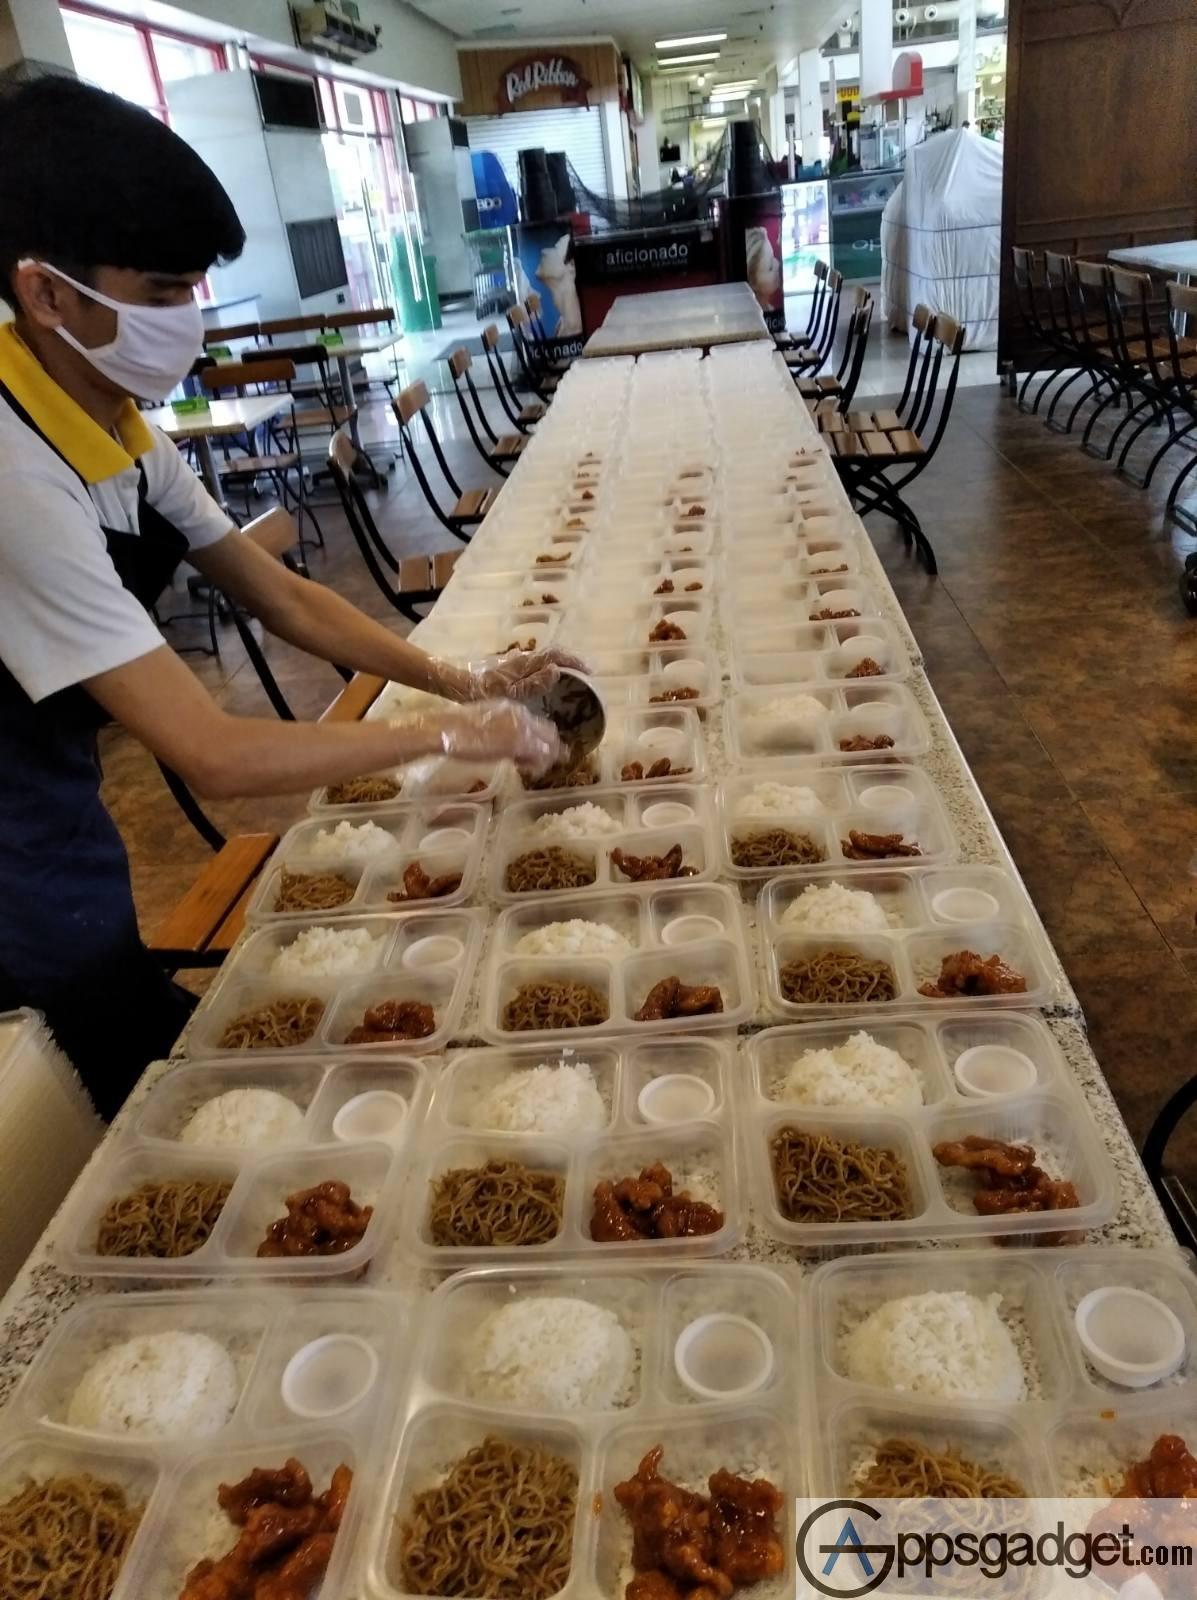 Globe myBusiness food distribution to hospitals 8